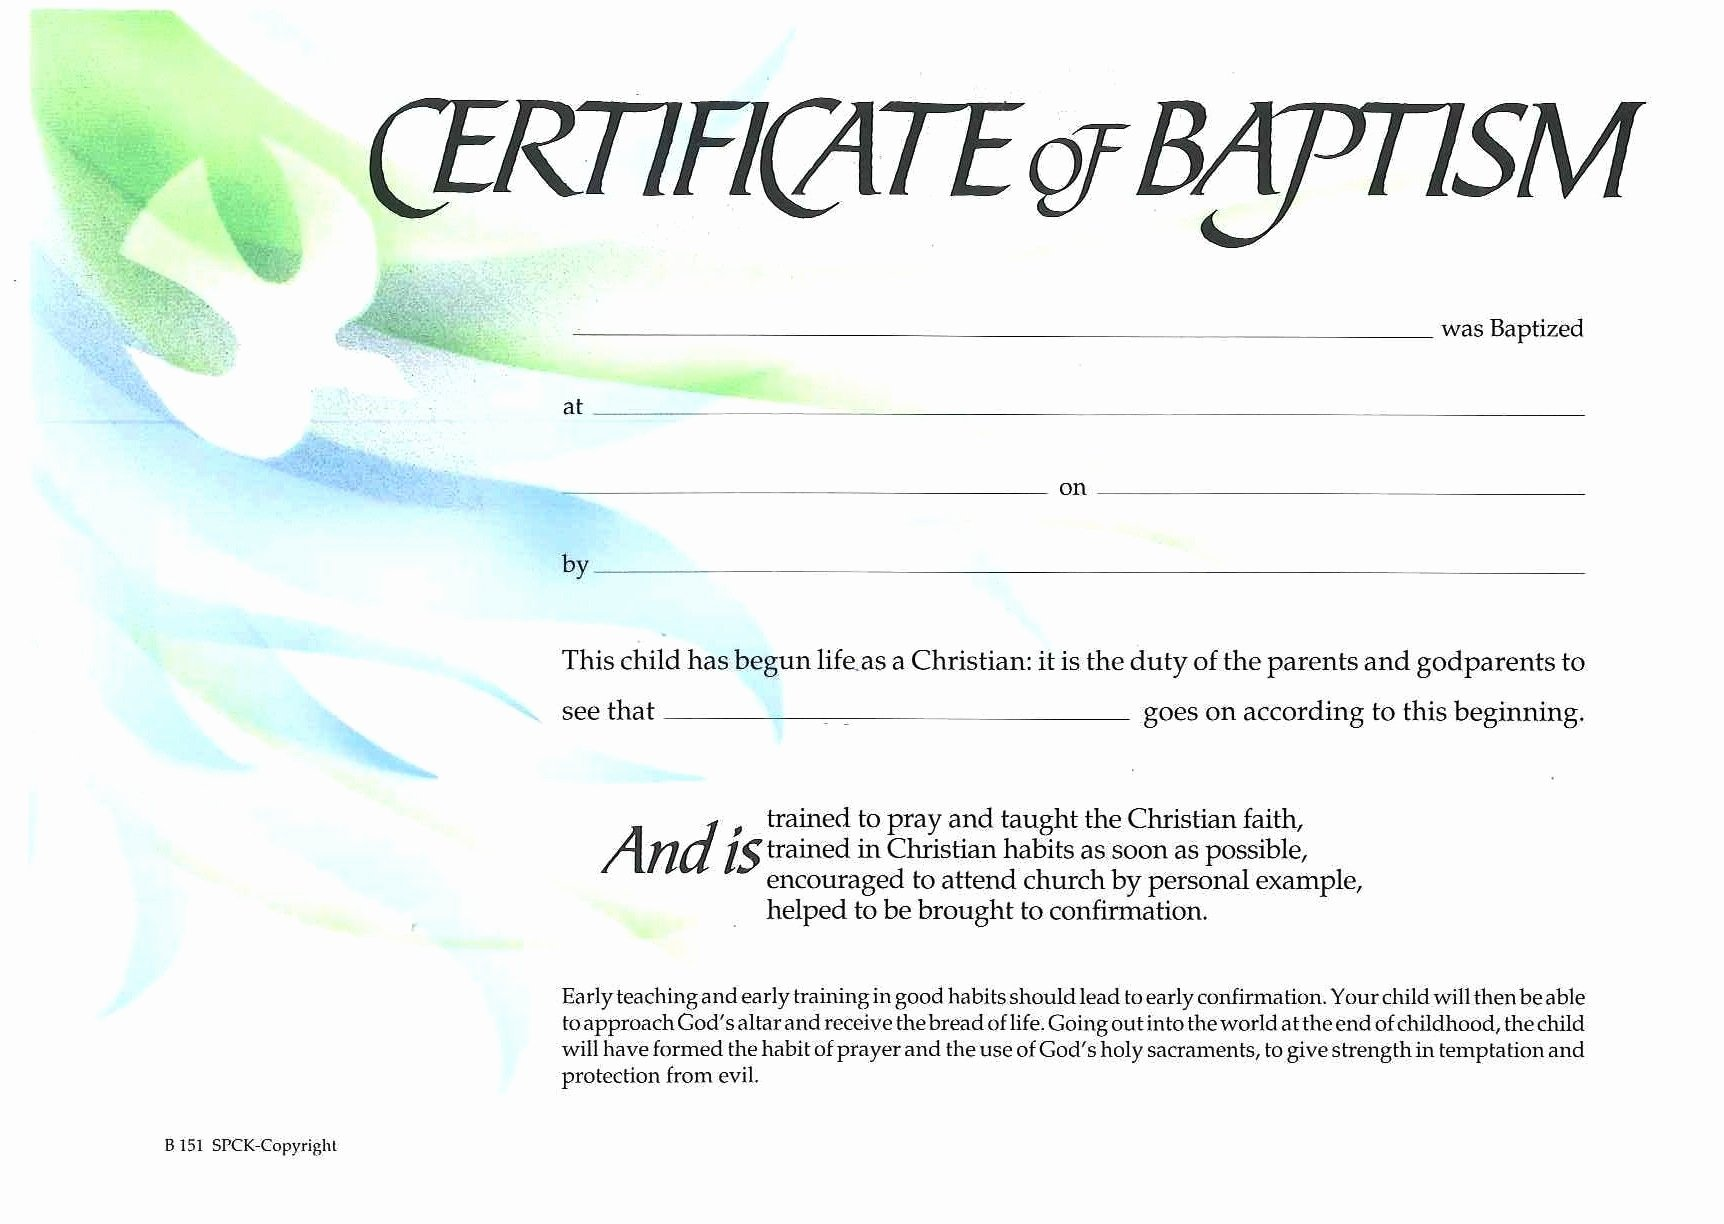 Certificate Of Baptism Template Beautiful Baptism Certificate Xp4eamuz Sunday School